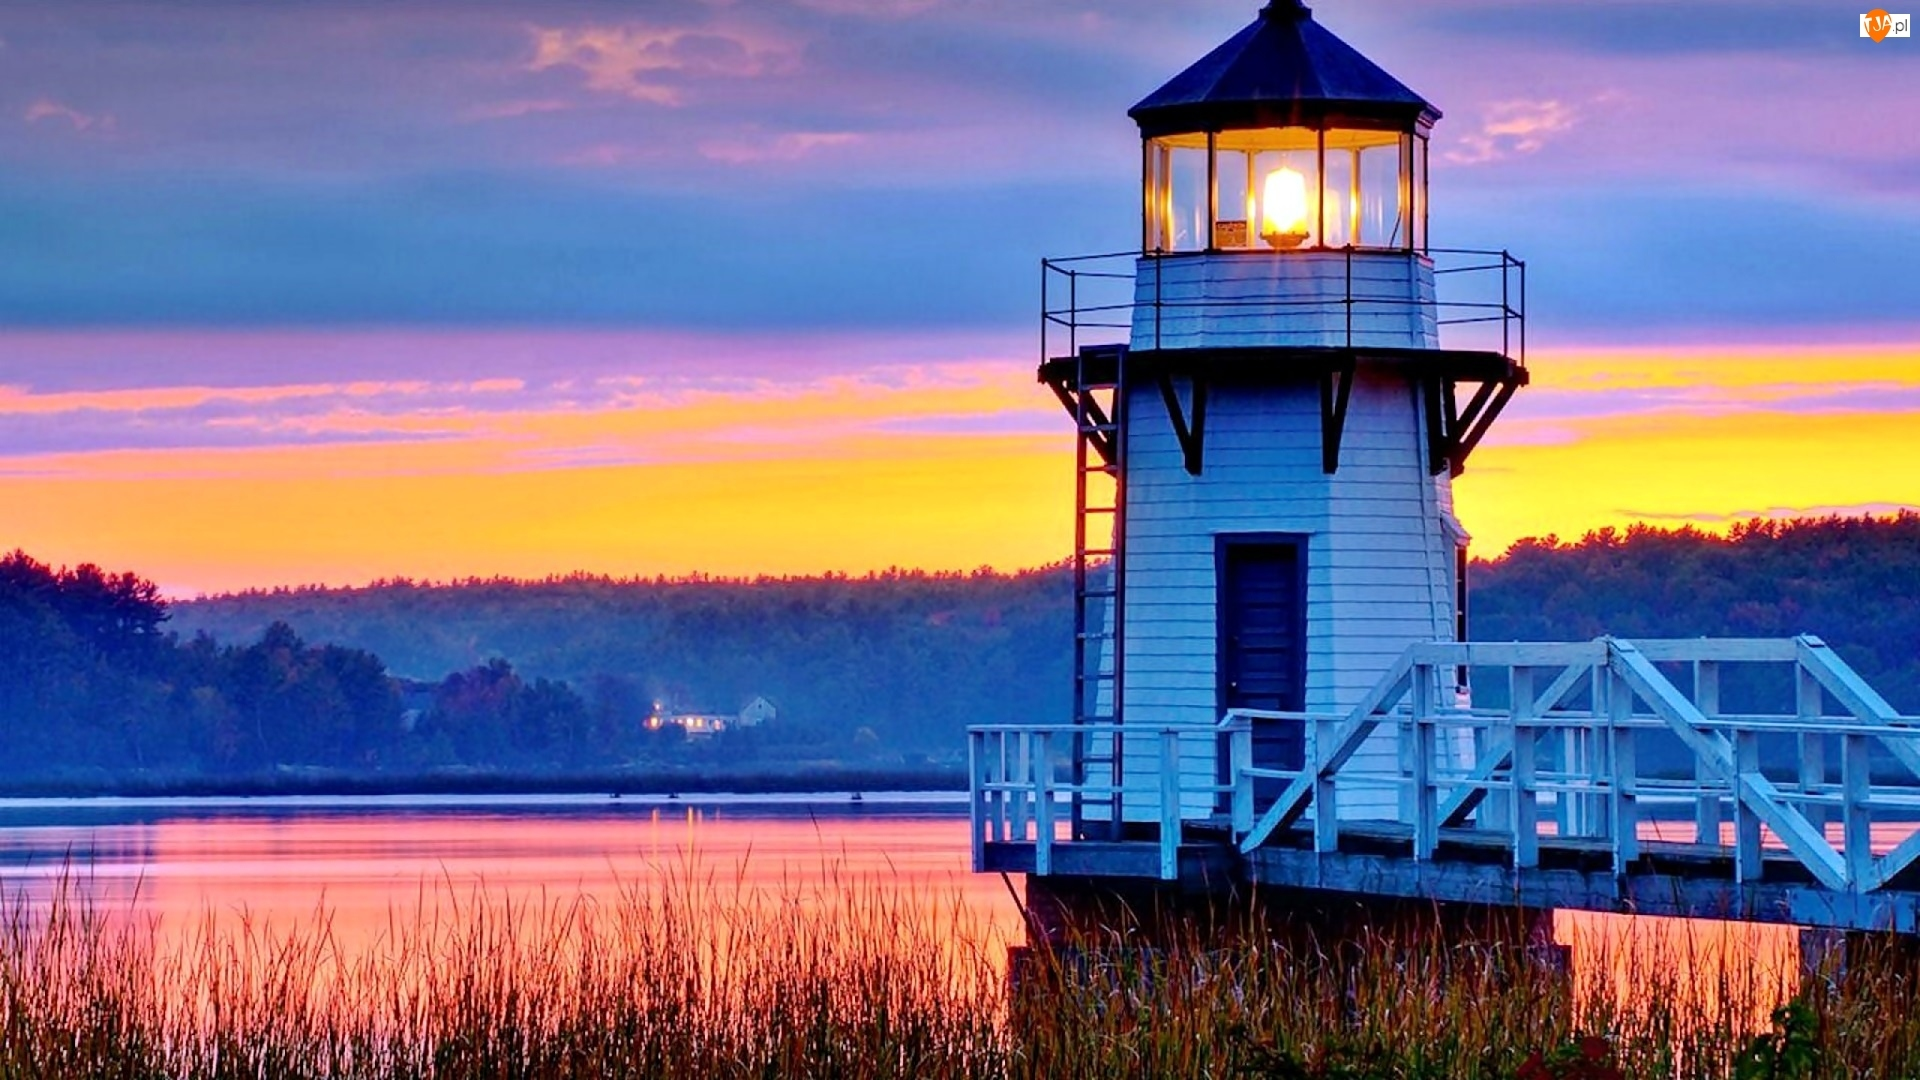 Morska, Kennebec, Arrowsic, Maine, Las, Rzeka, Latarnia